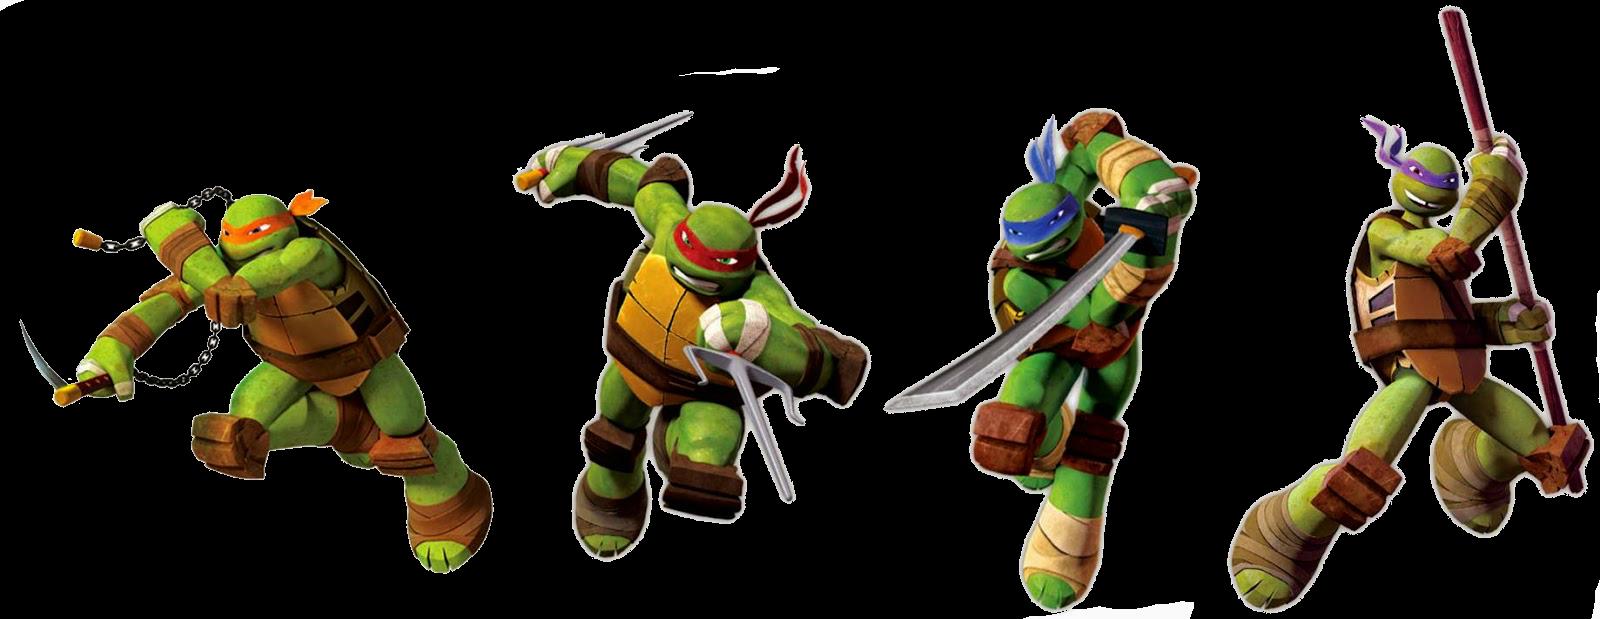 Ba de imagens tartaruga ninja png tartaruga ninja png thecheapjerseys Image collections